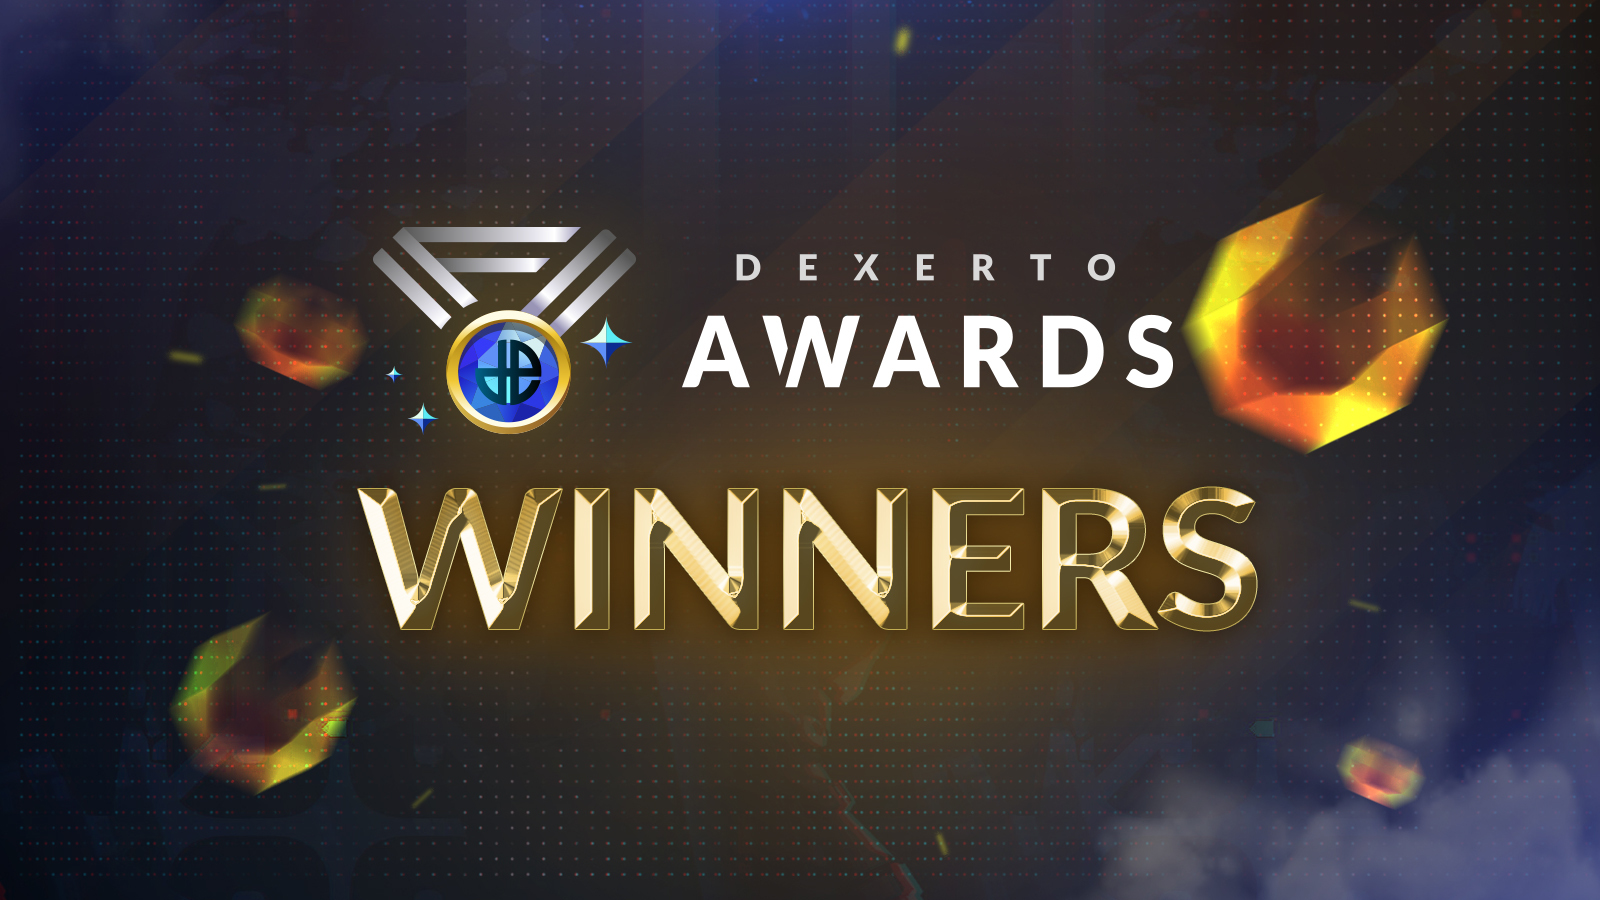 Dexerto Awards 2020 winners results